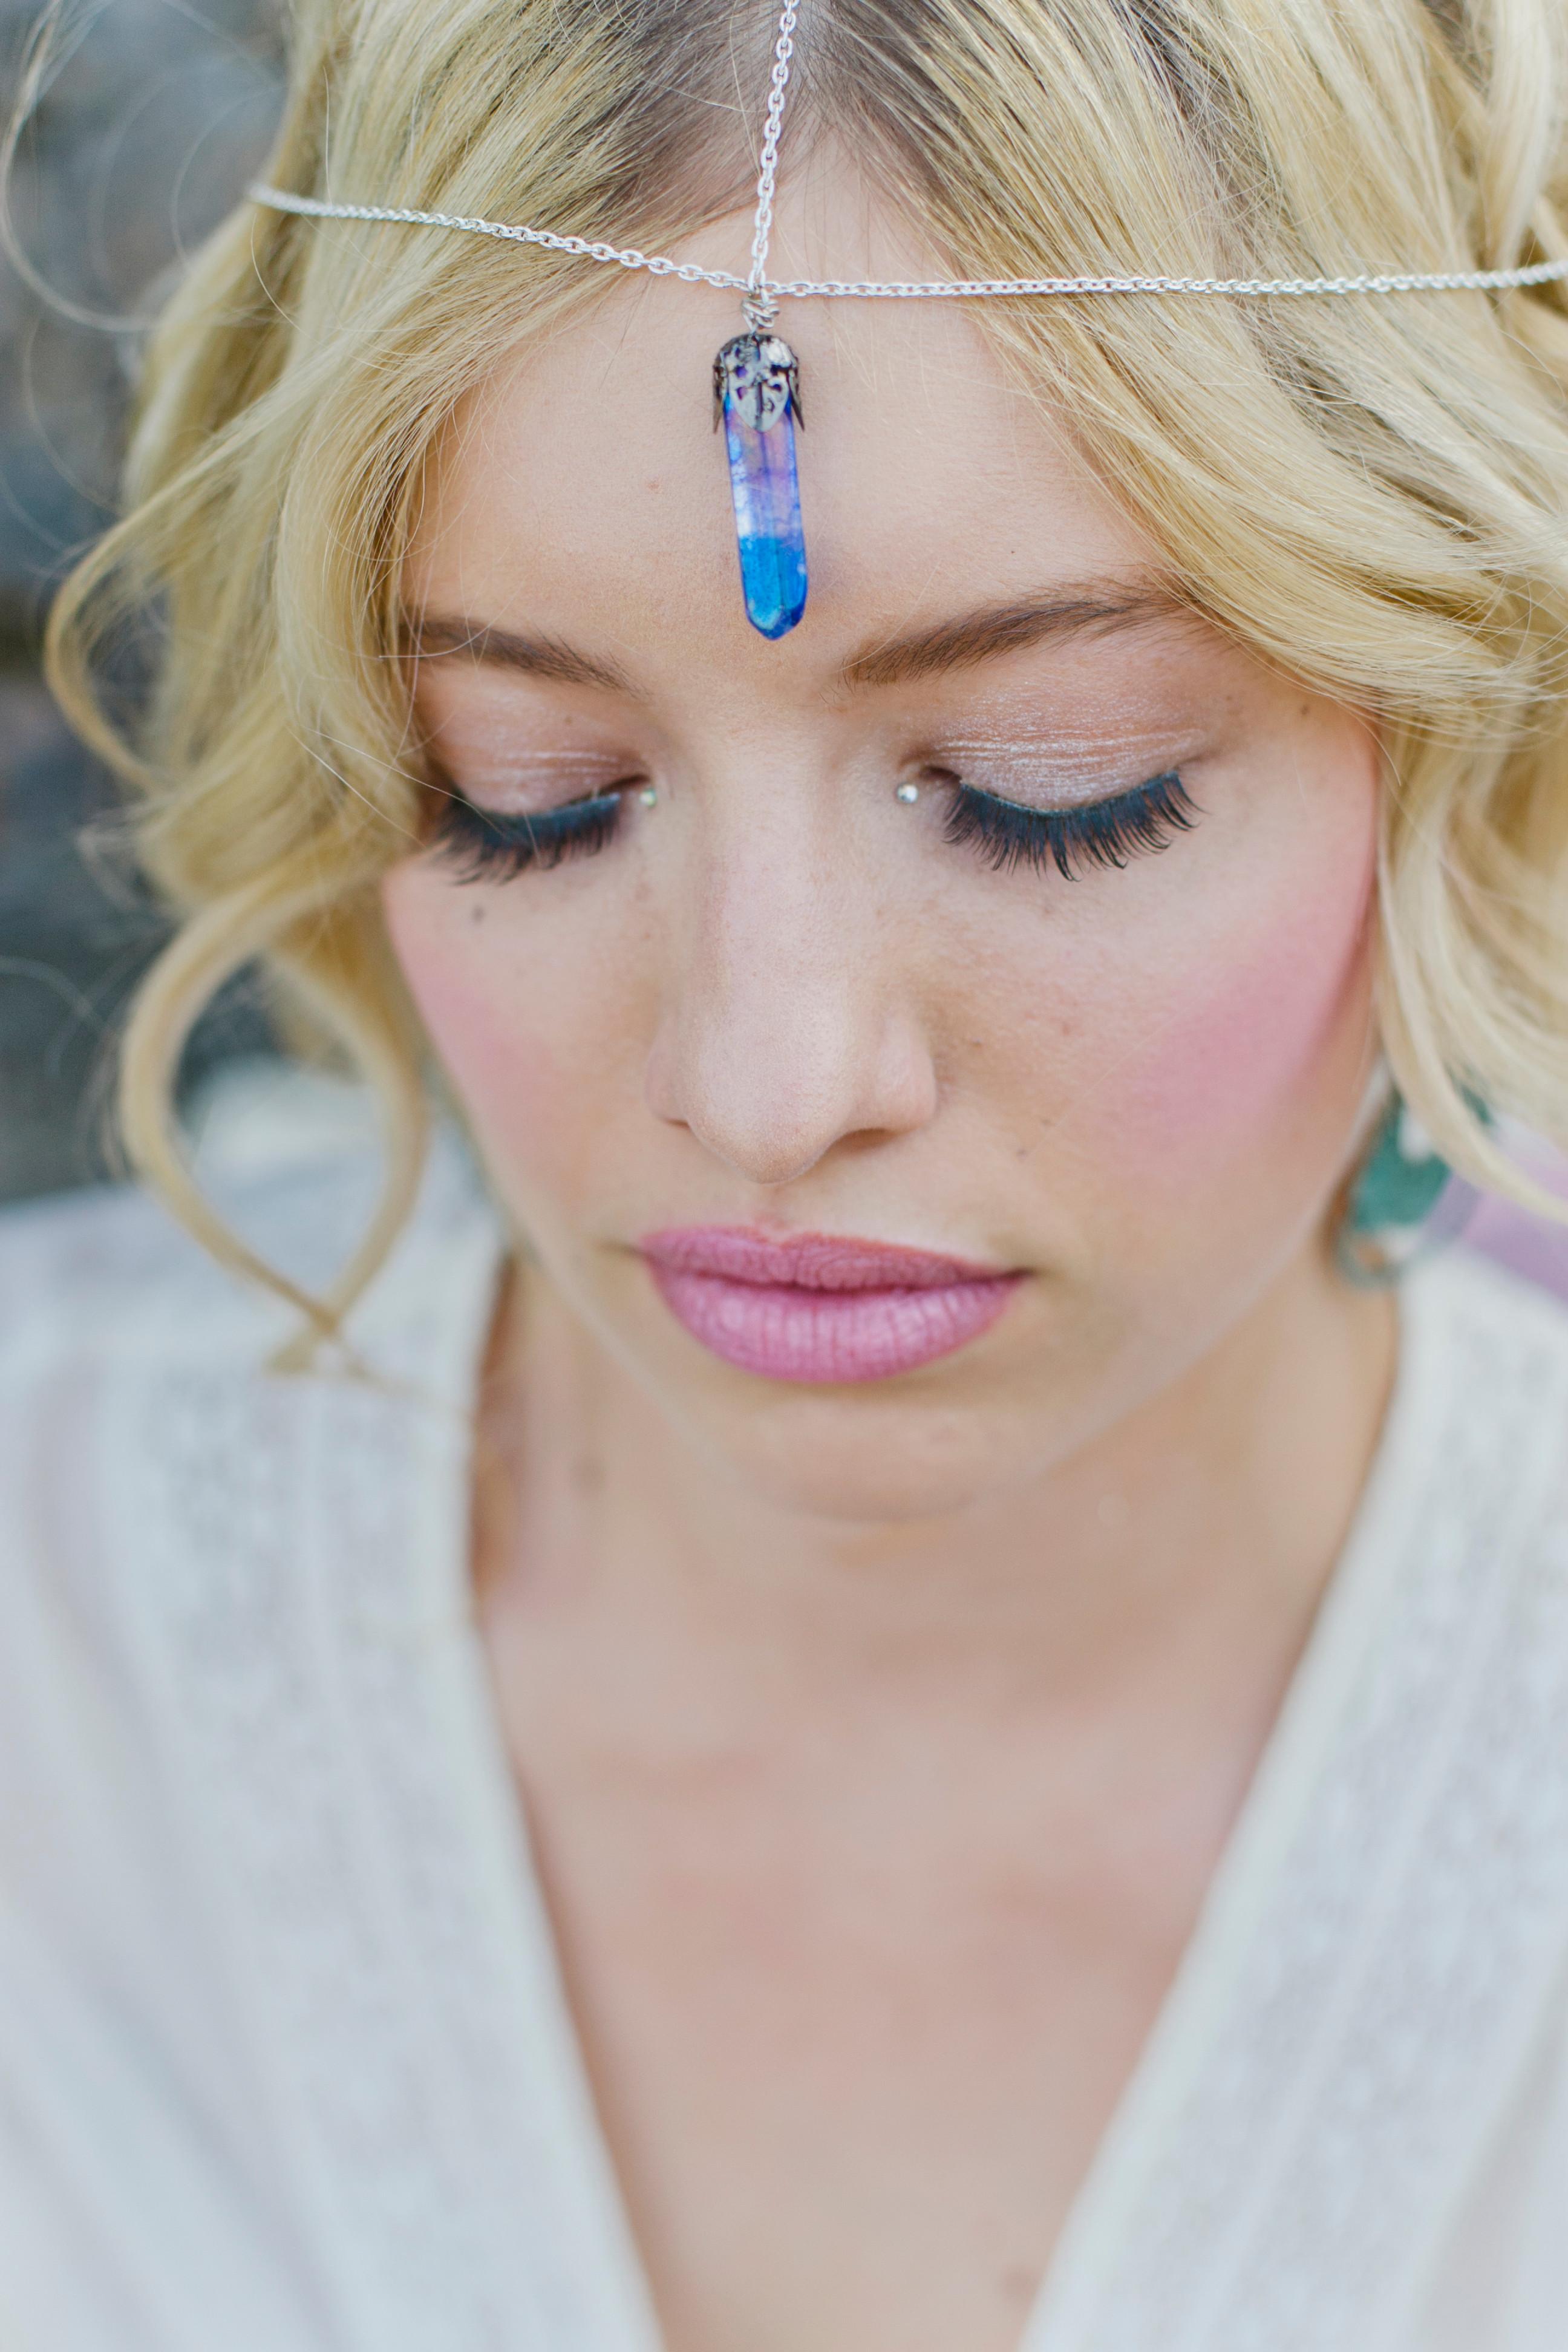 Makeup & Lash Application